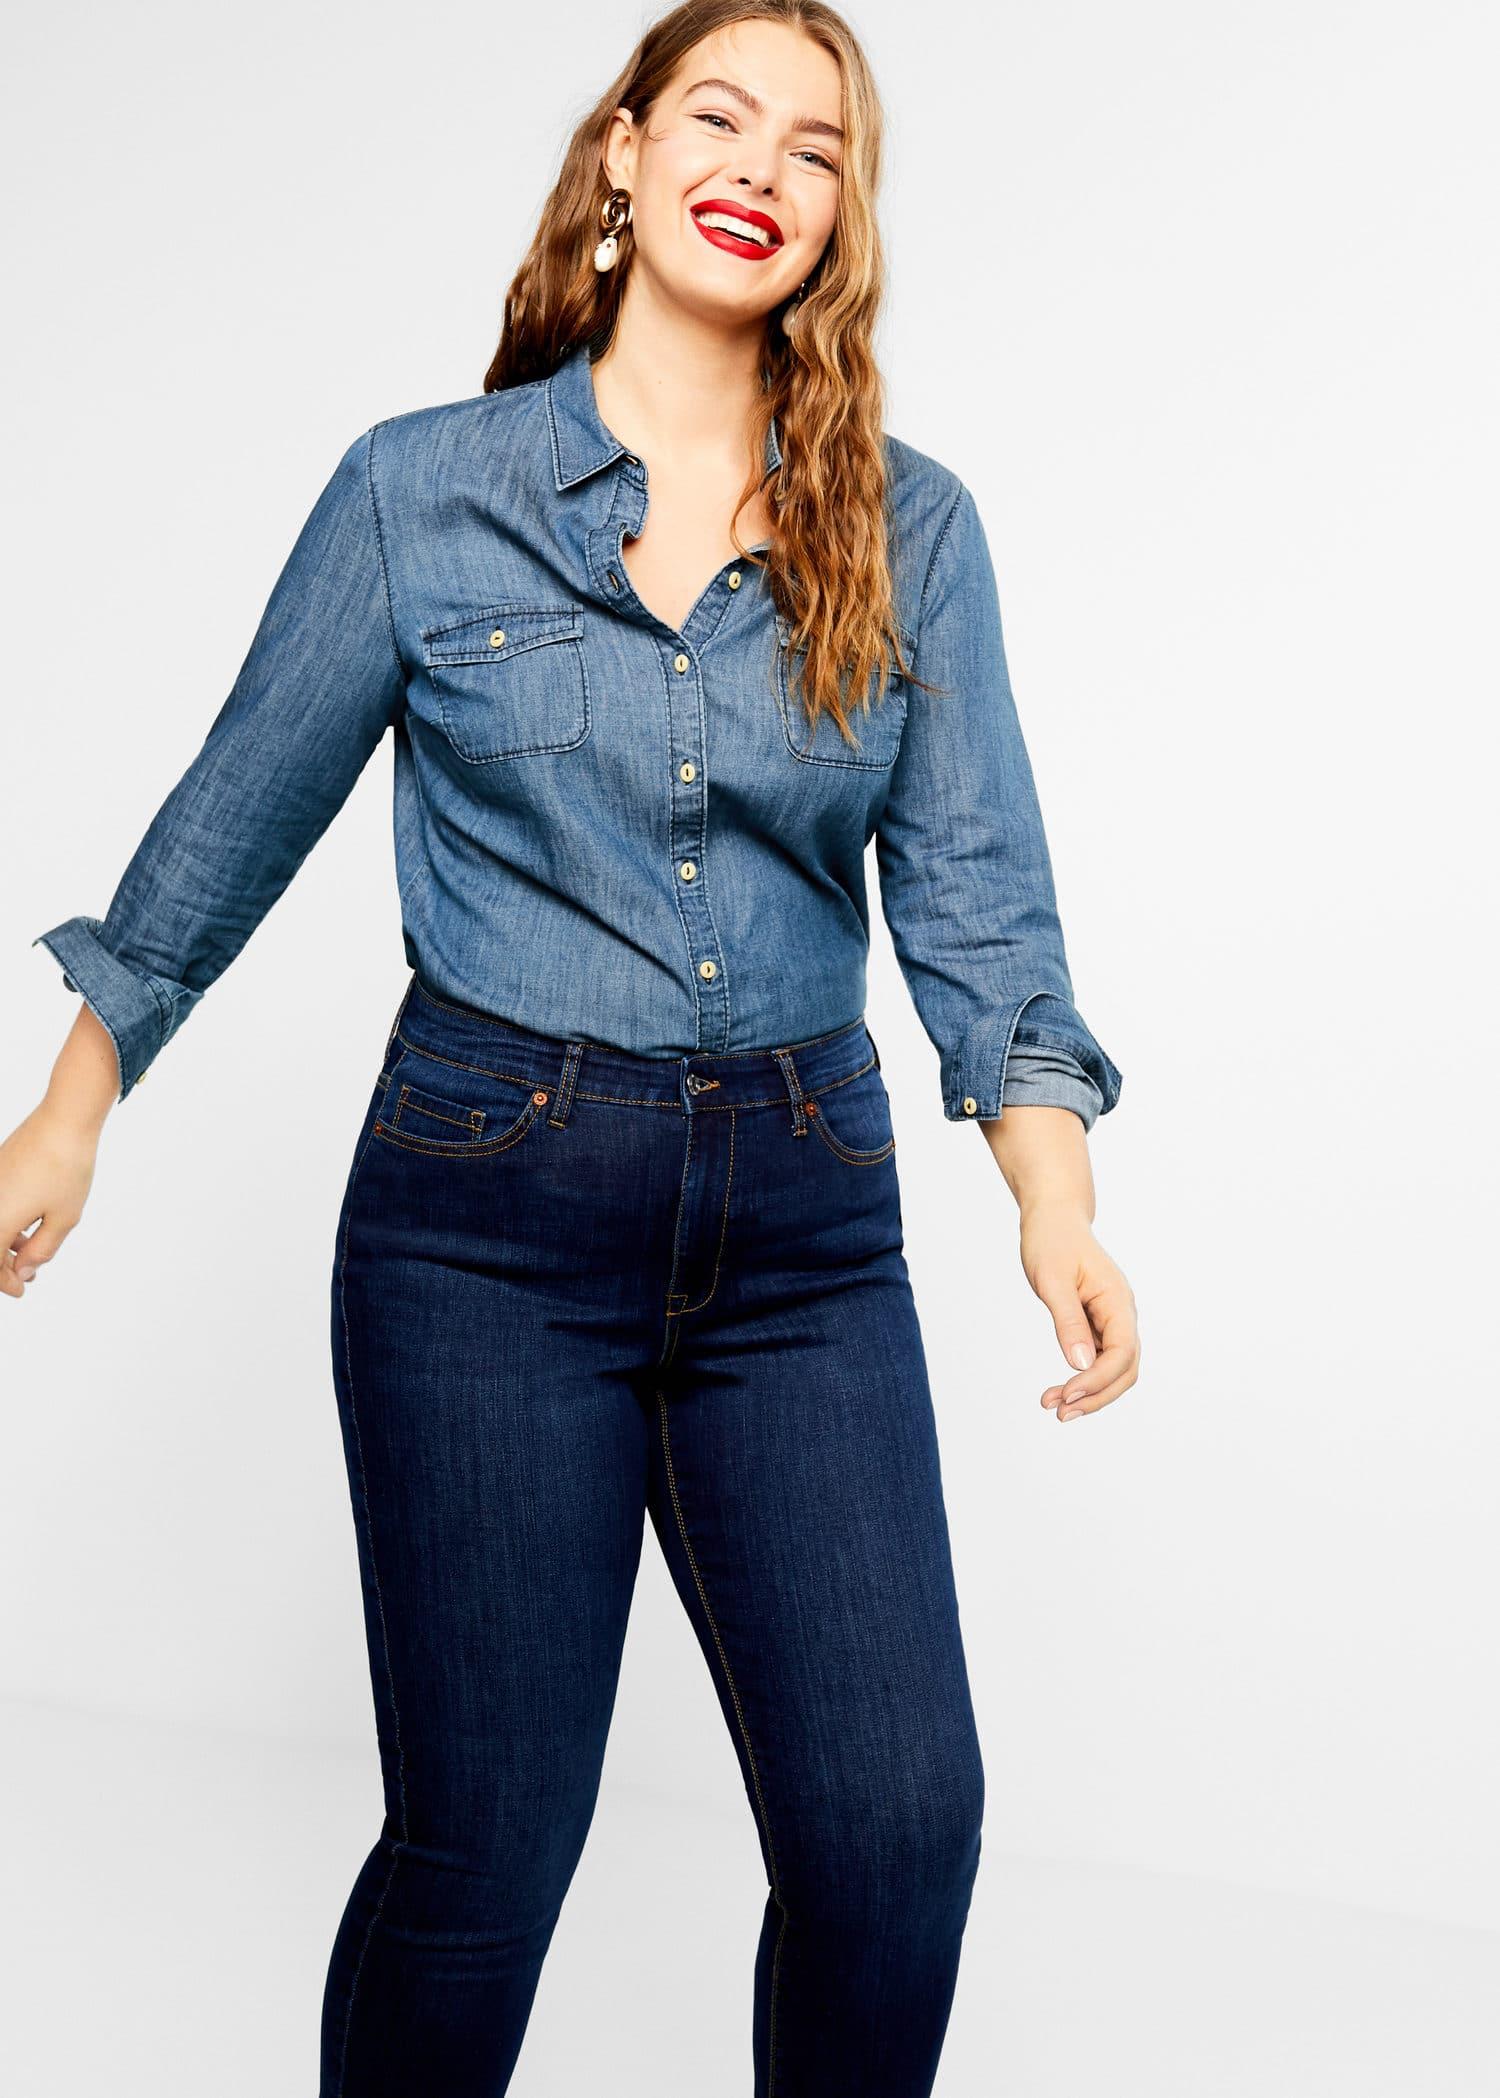 Plano slim Susan Susan Jeans slim general Jeans slim Plano general Jeans 5wtqO